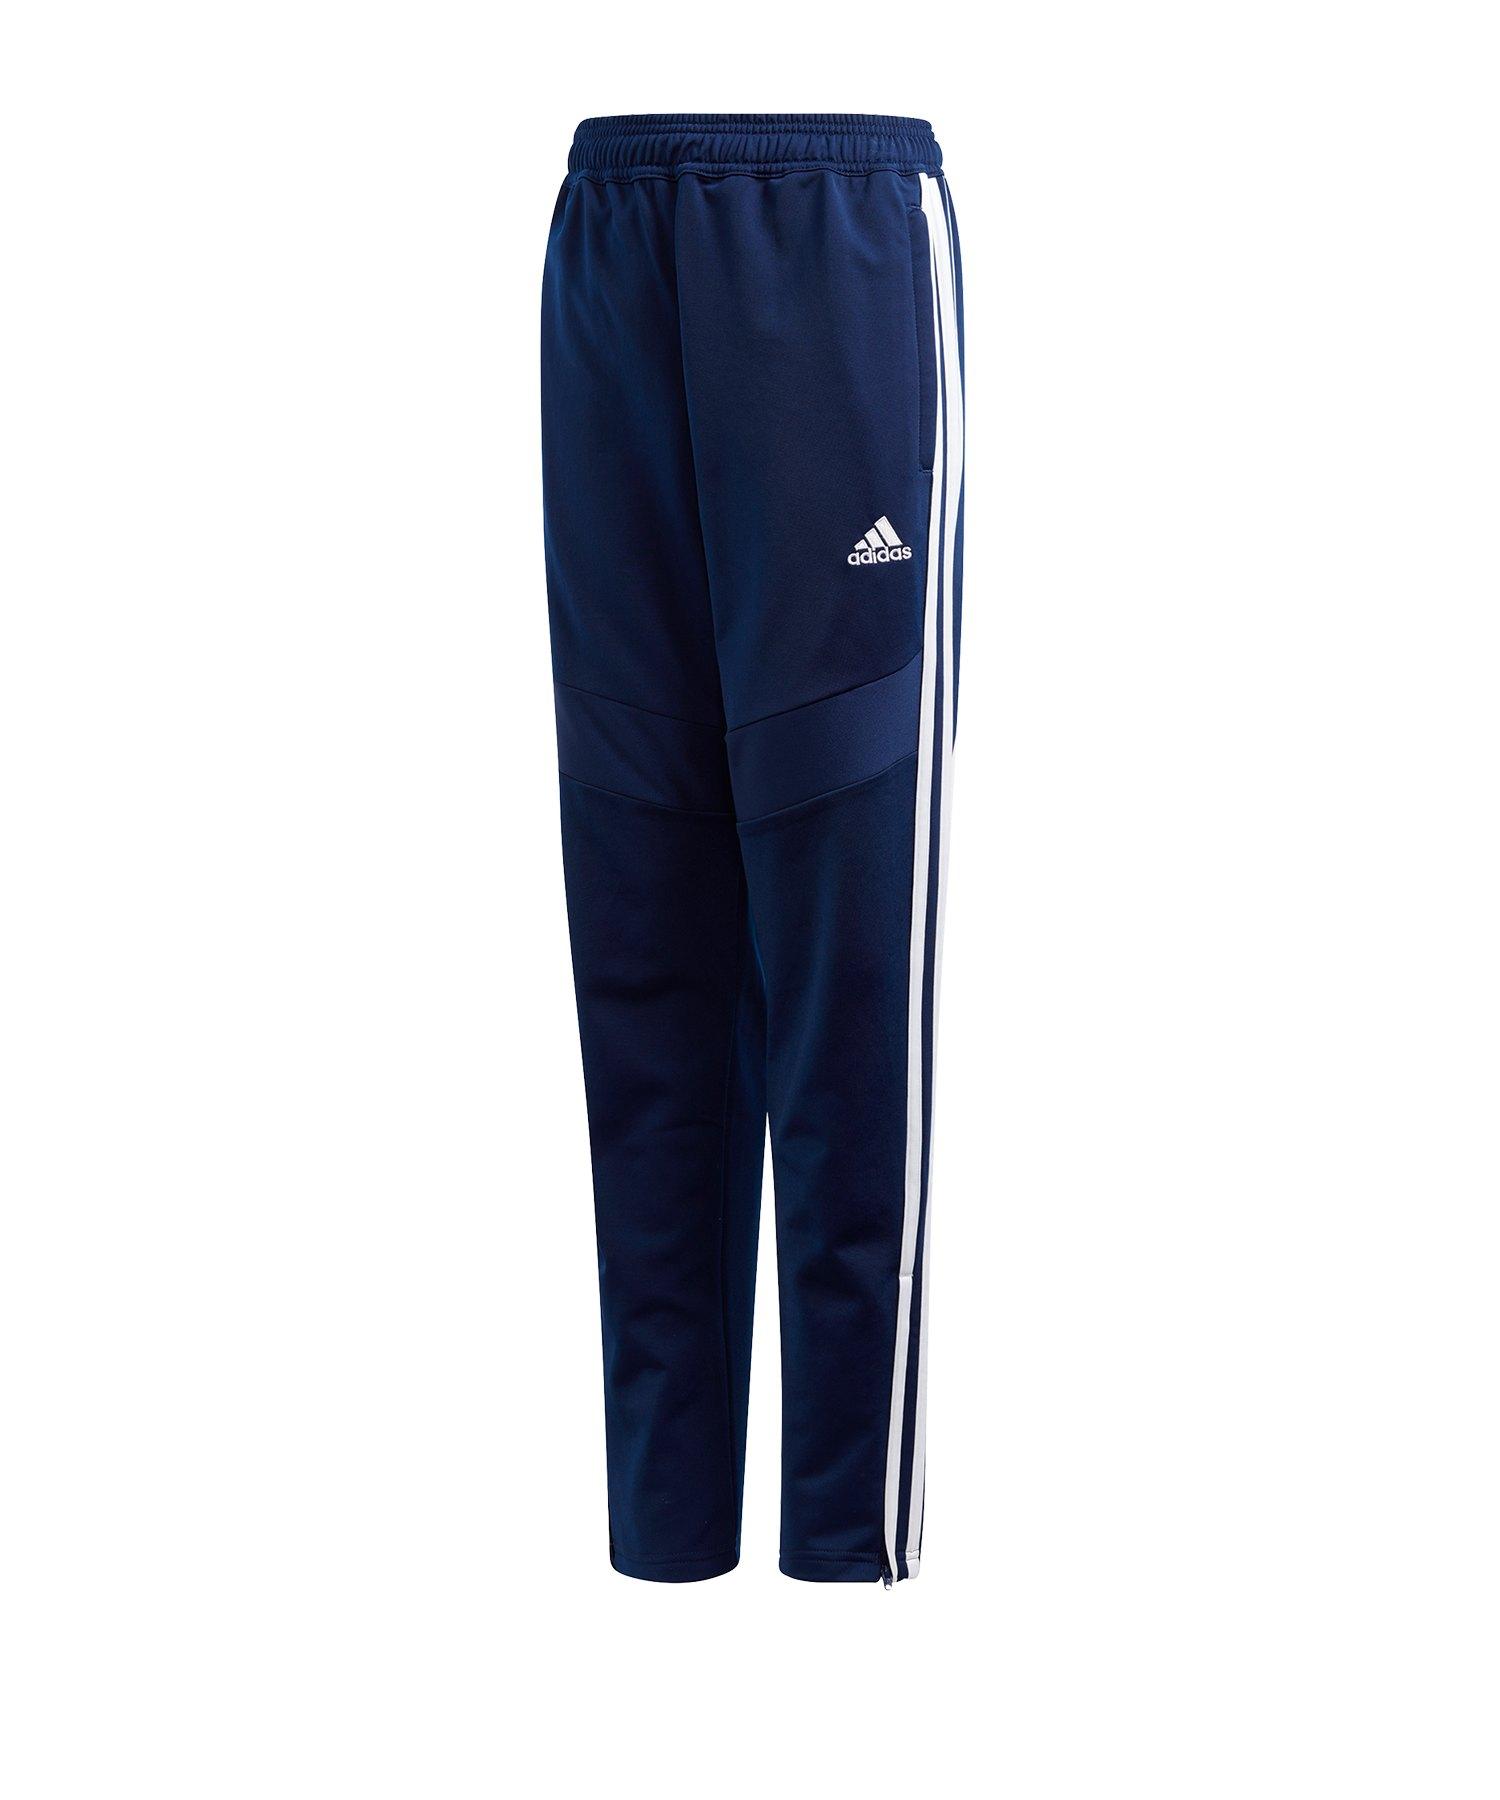 adidas Tiro 19 Polyesterhose Kids Dunkelblau Weiss - blau